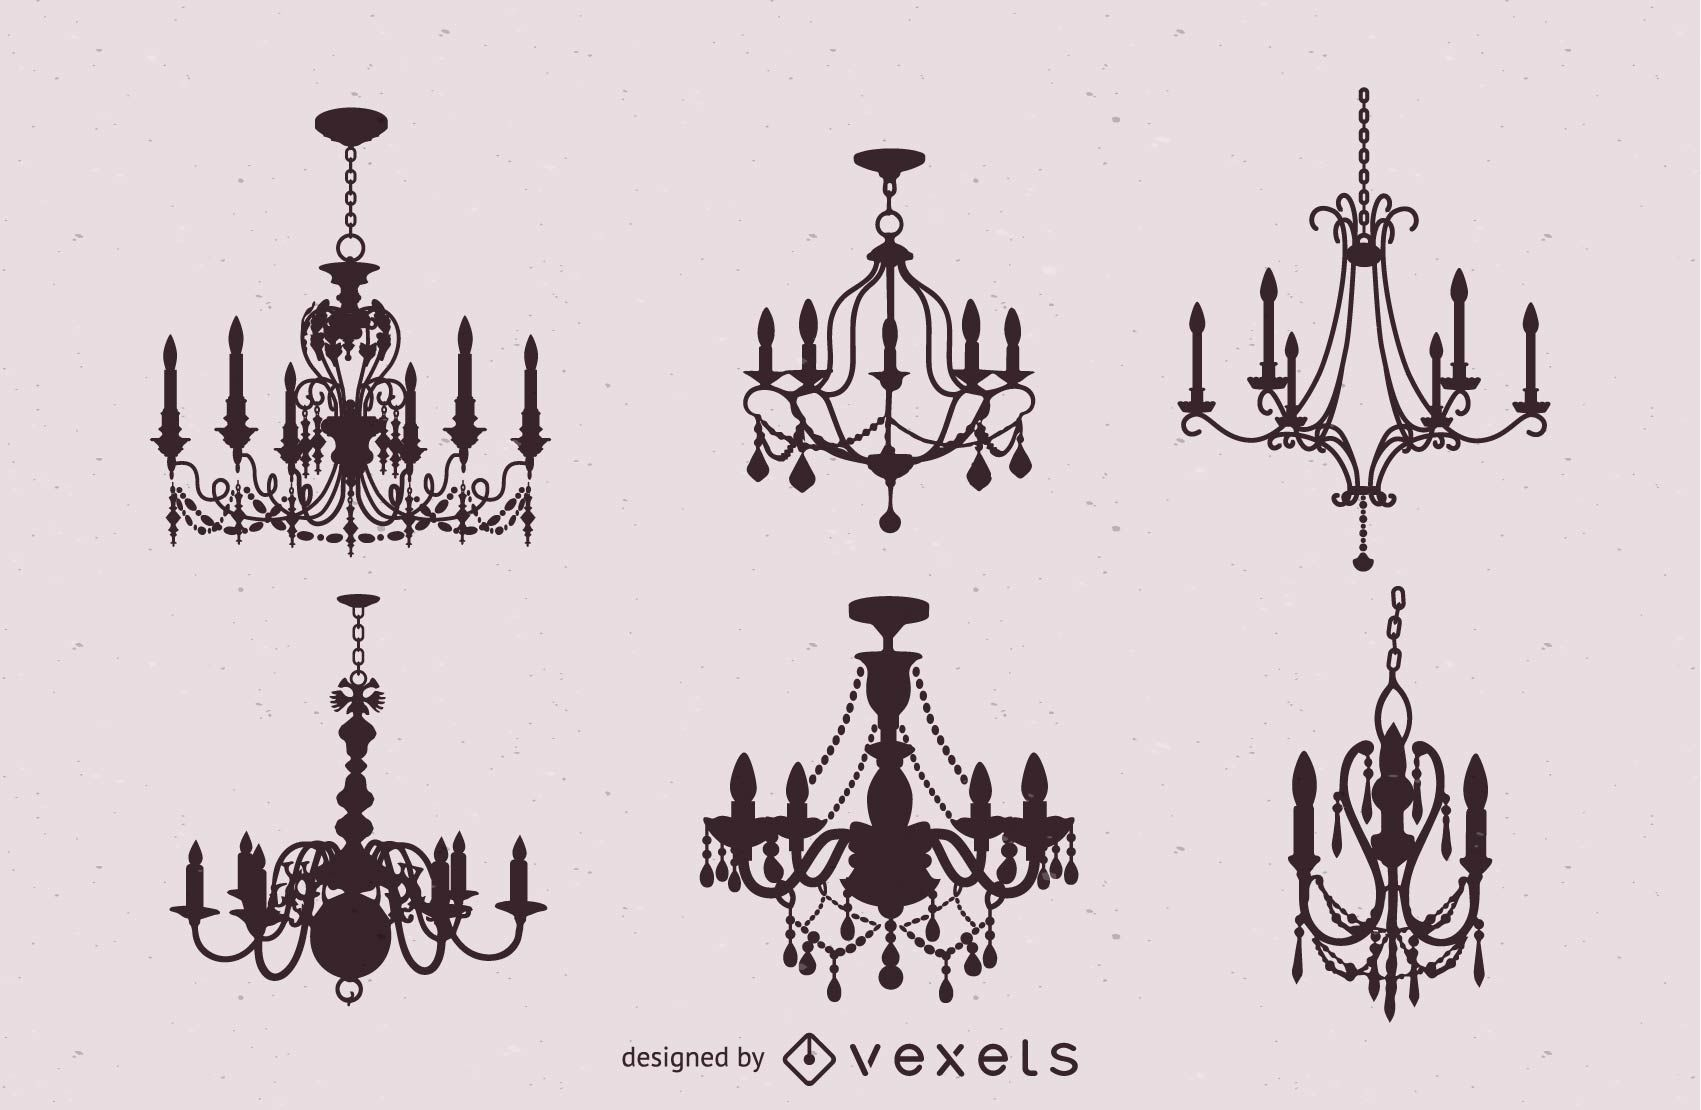 Seis candelabros vintage